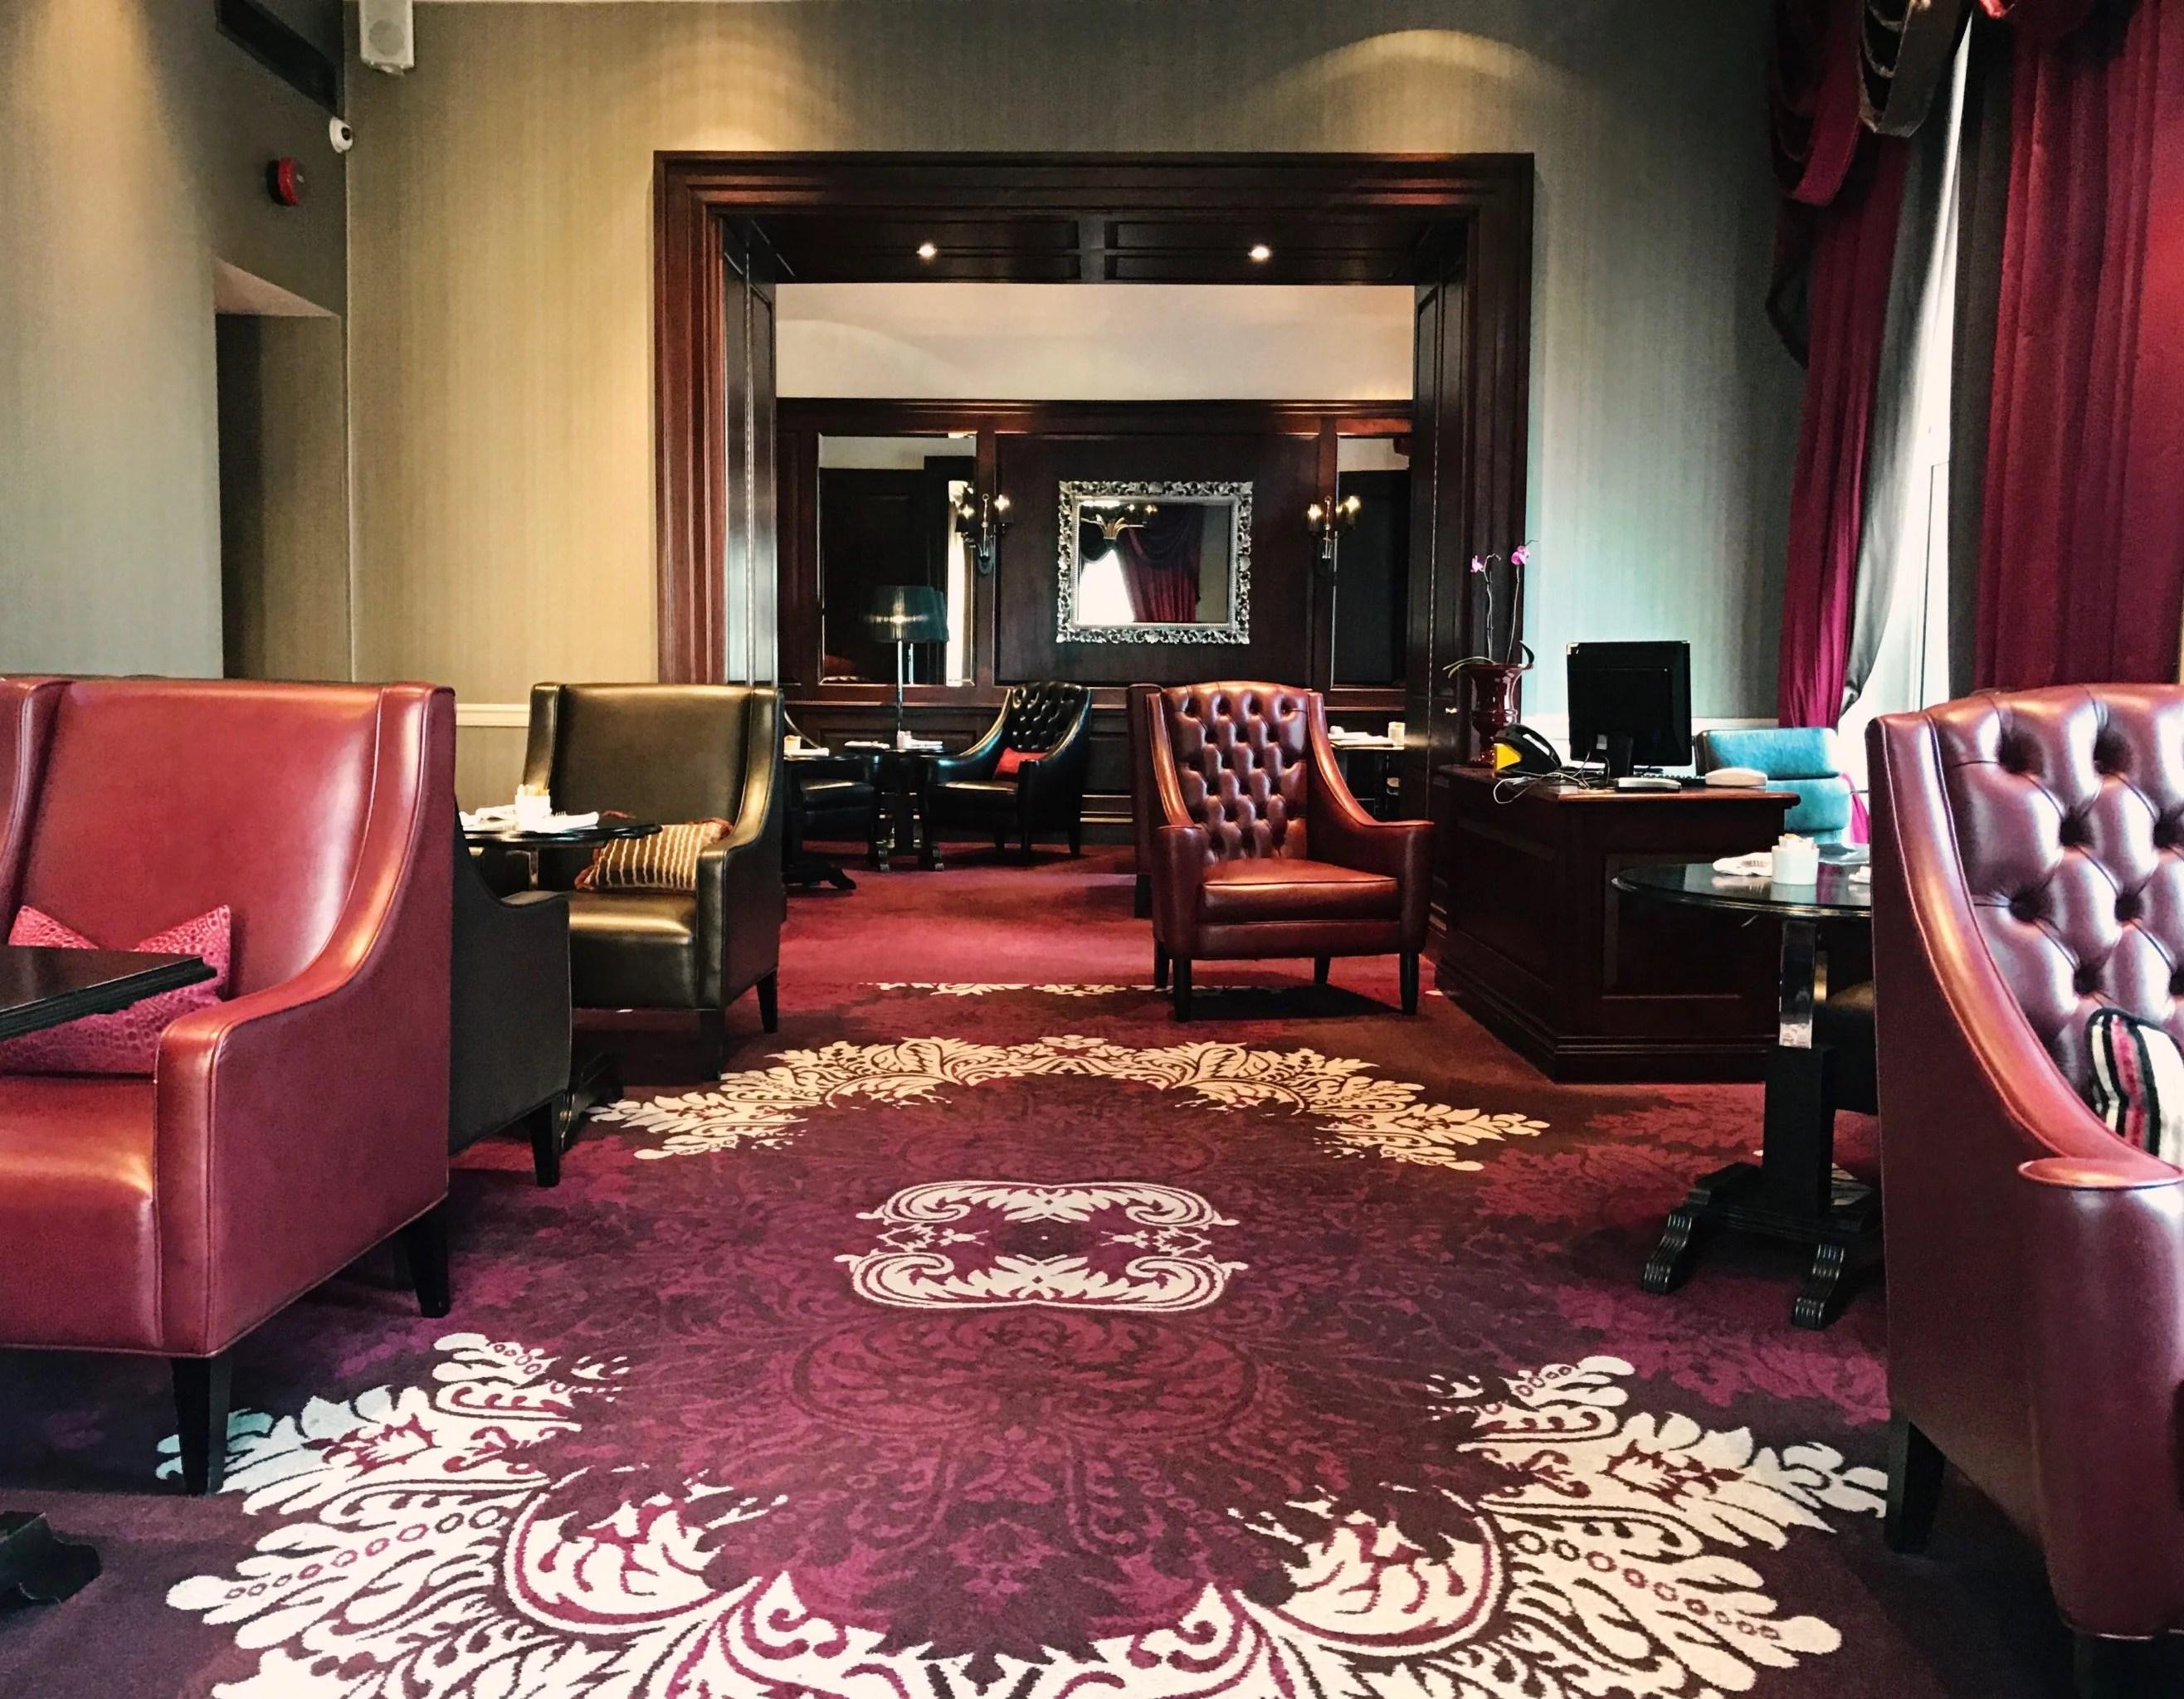 Grosvenor Hotel Buckingham Palace Rd London